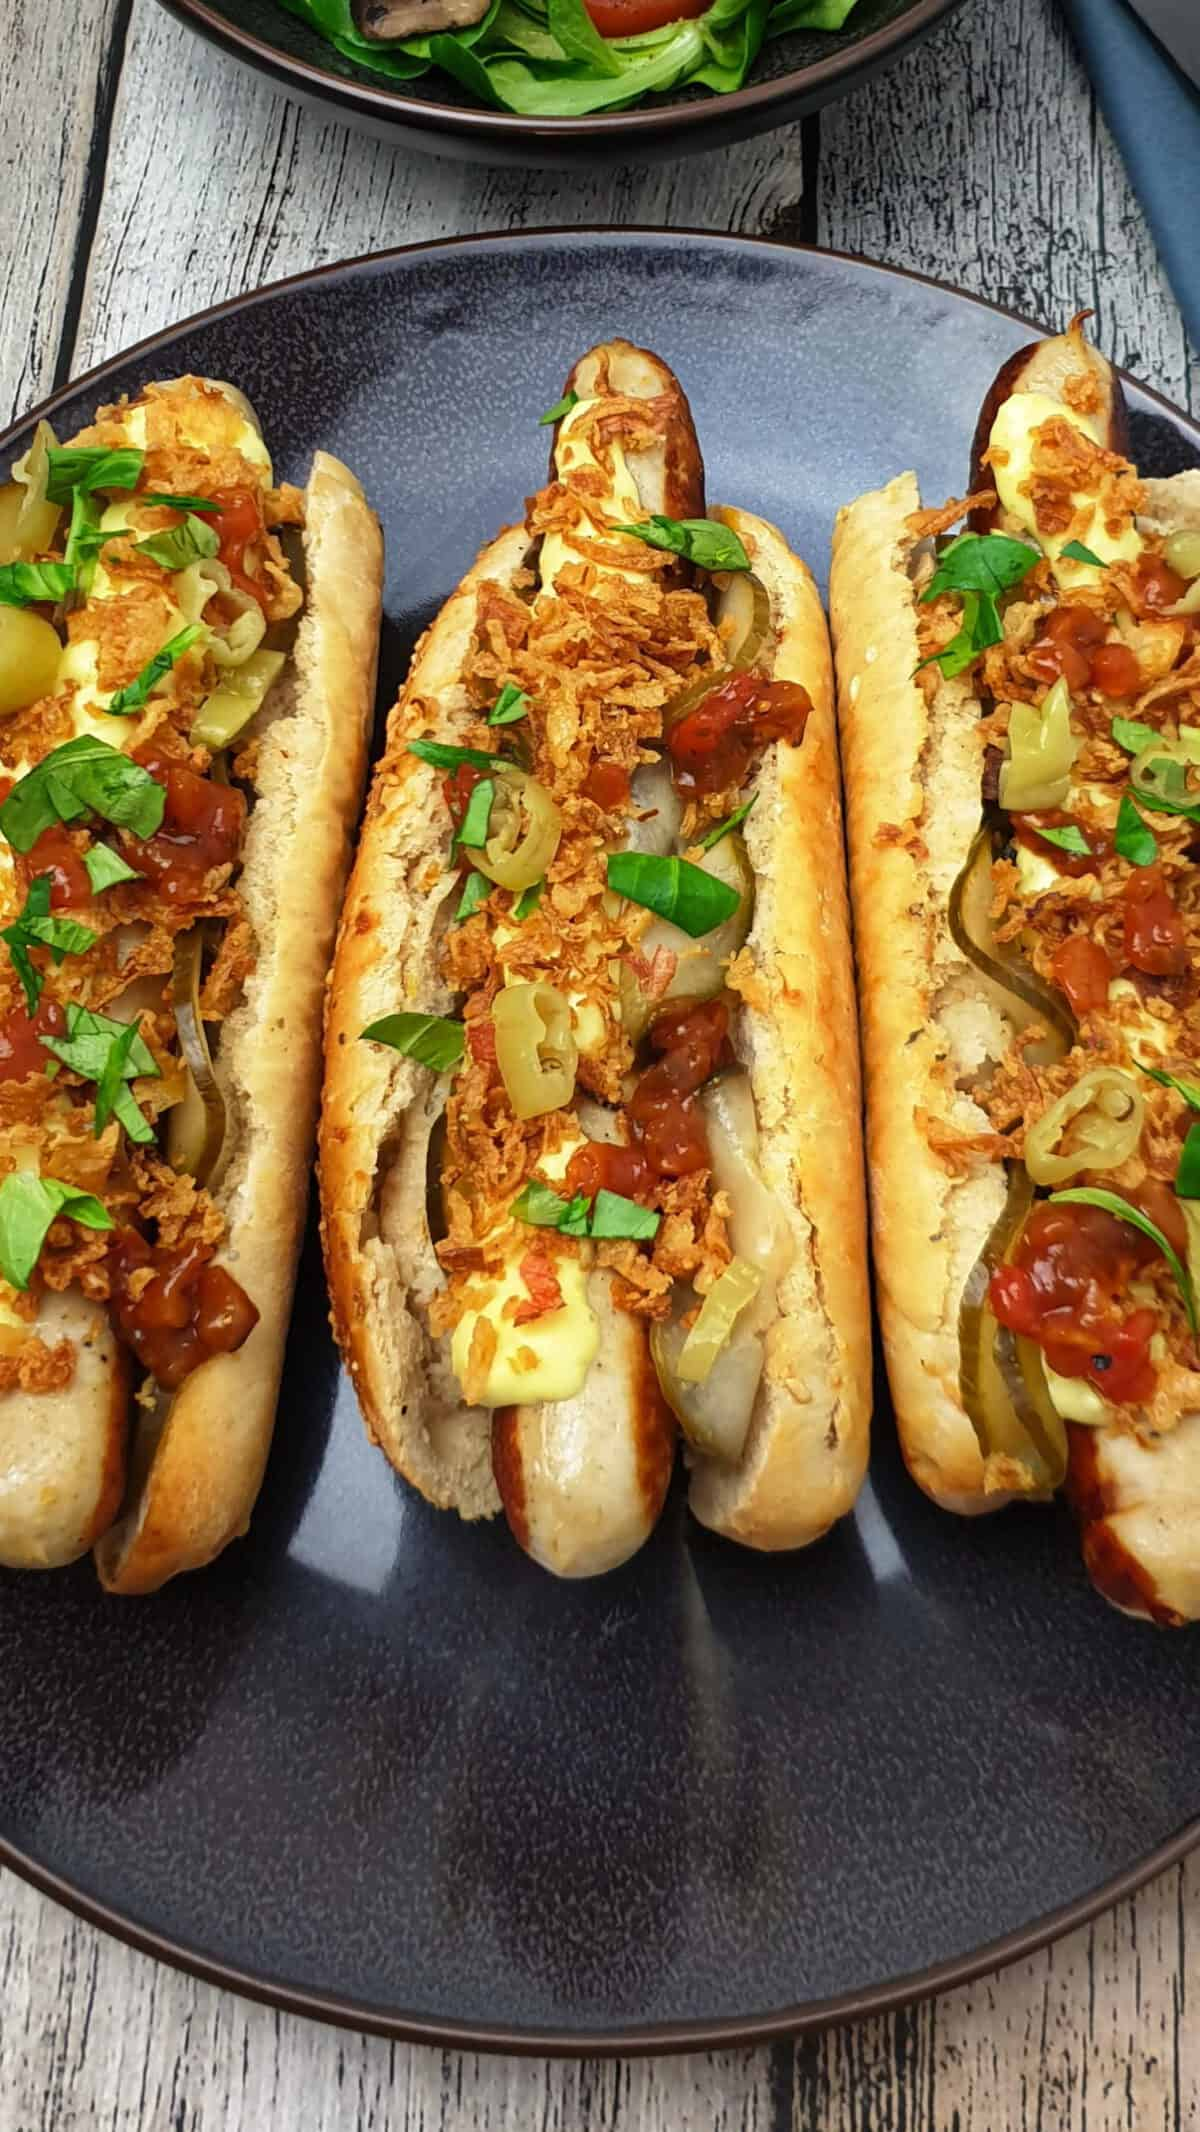 Hot Dogs mit Bratwurst und Jalapenos im selbst gebackenem Parmesan-Oregano-Baguette Brötchen